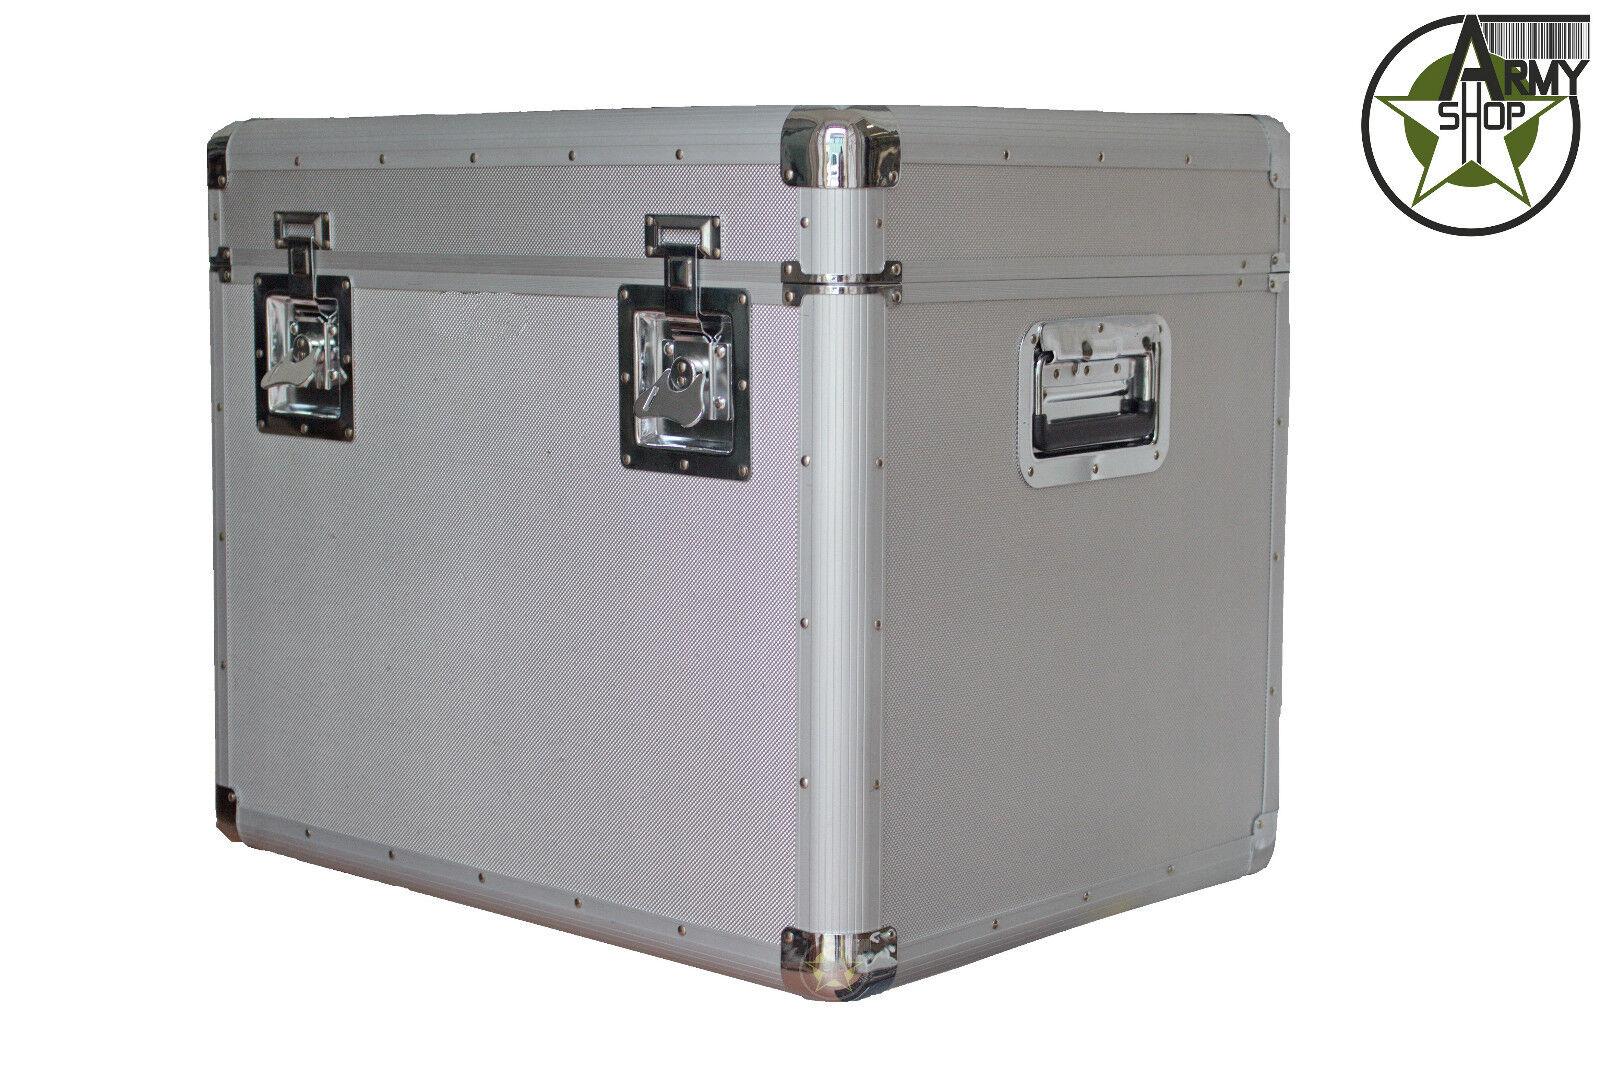 Camping Kiste Werkzeugkoffer Transportbox Werkzeugkiste Transportkiste Box L NEU